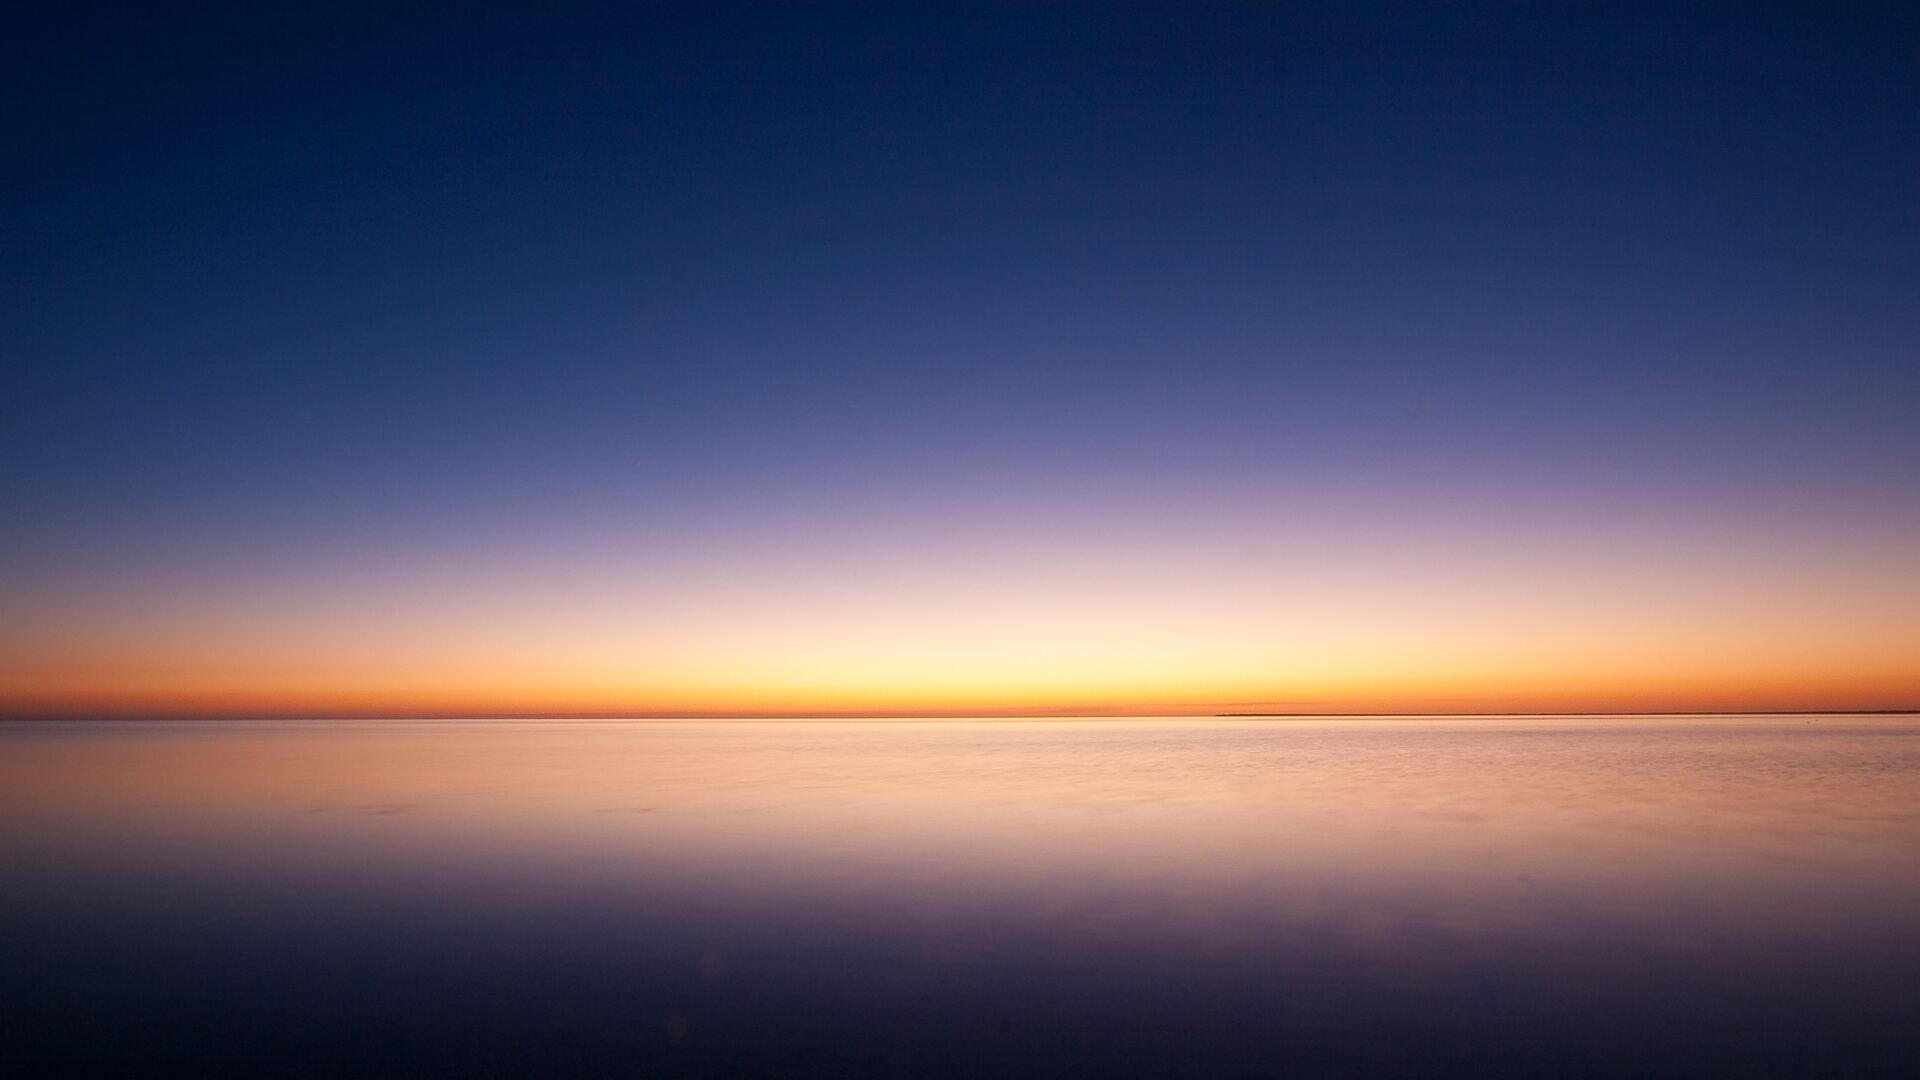 1920x1080 Sunrise Ocean Minimalism Simple Background ...